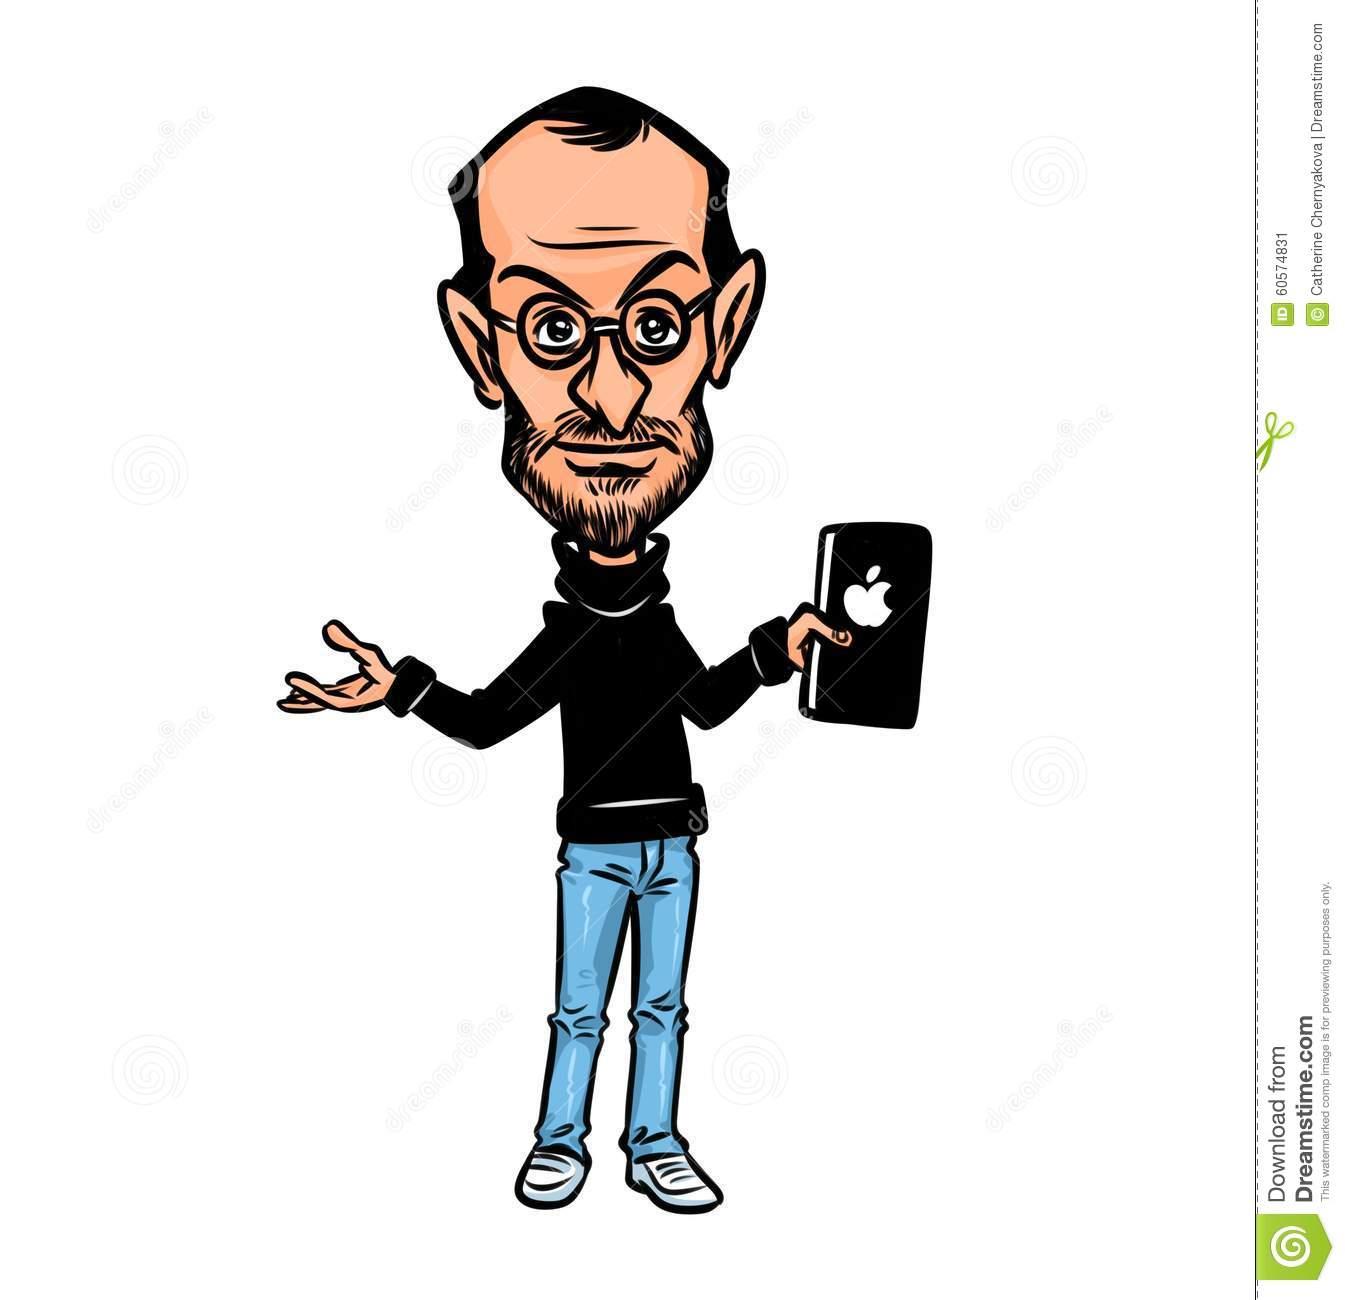 Steve Jobs Clip Art.